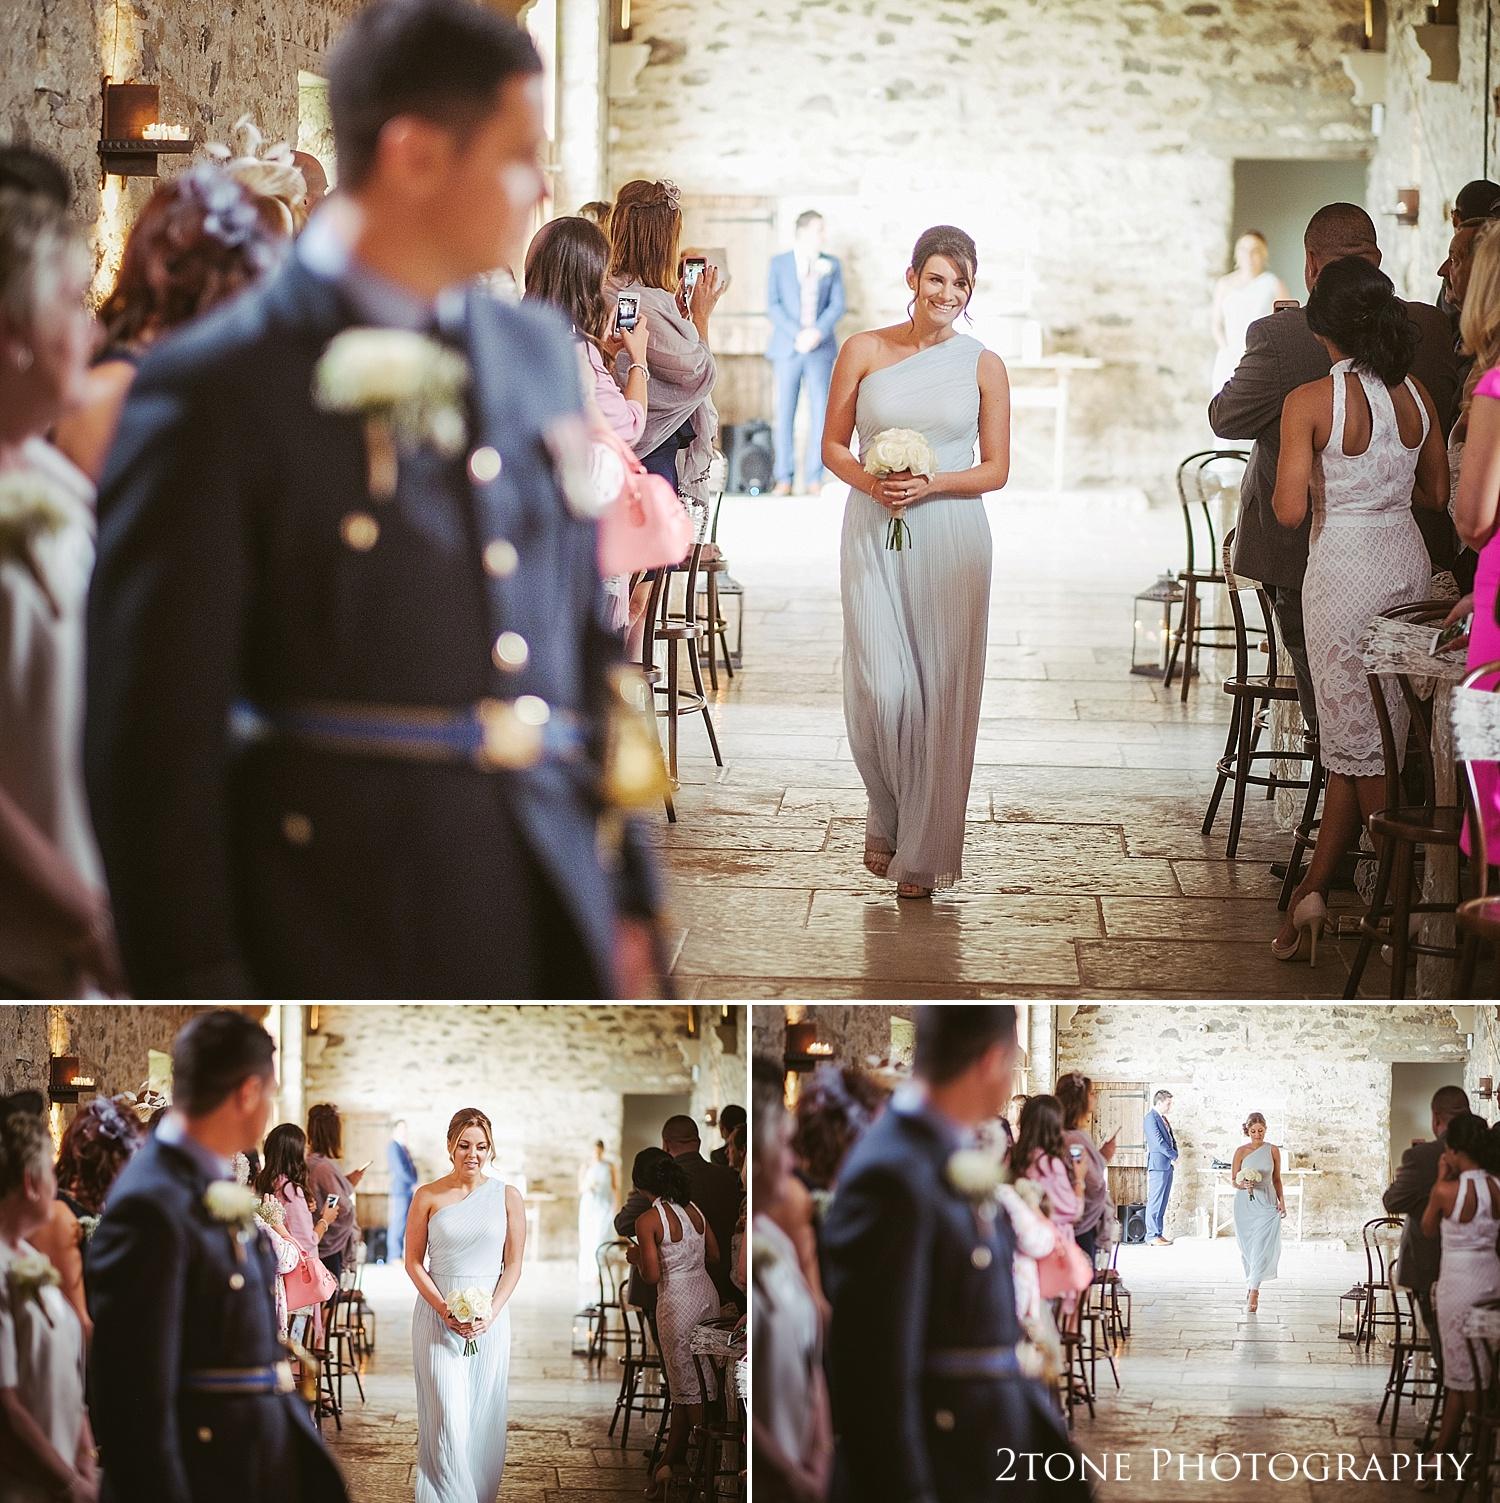 The bridesmaids at Healey Barn by wedding photography team 2tone Photography www.2tonephotography.co.uk